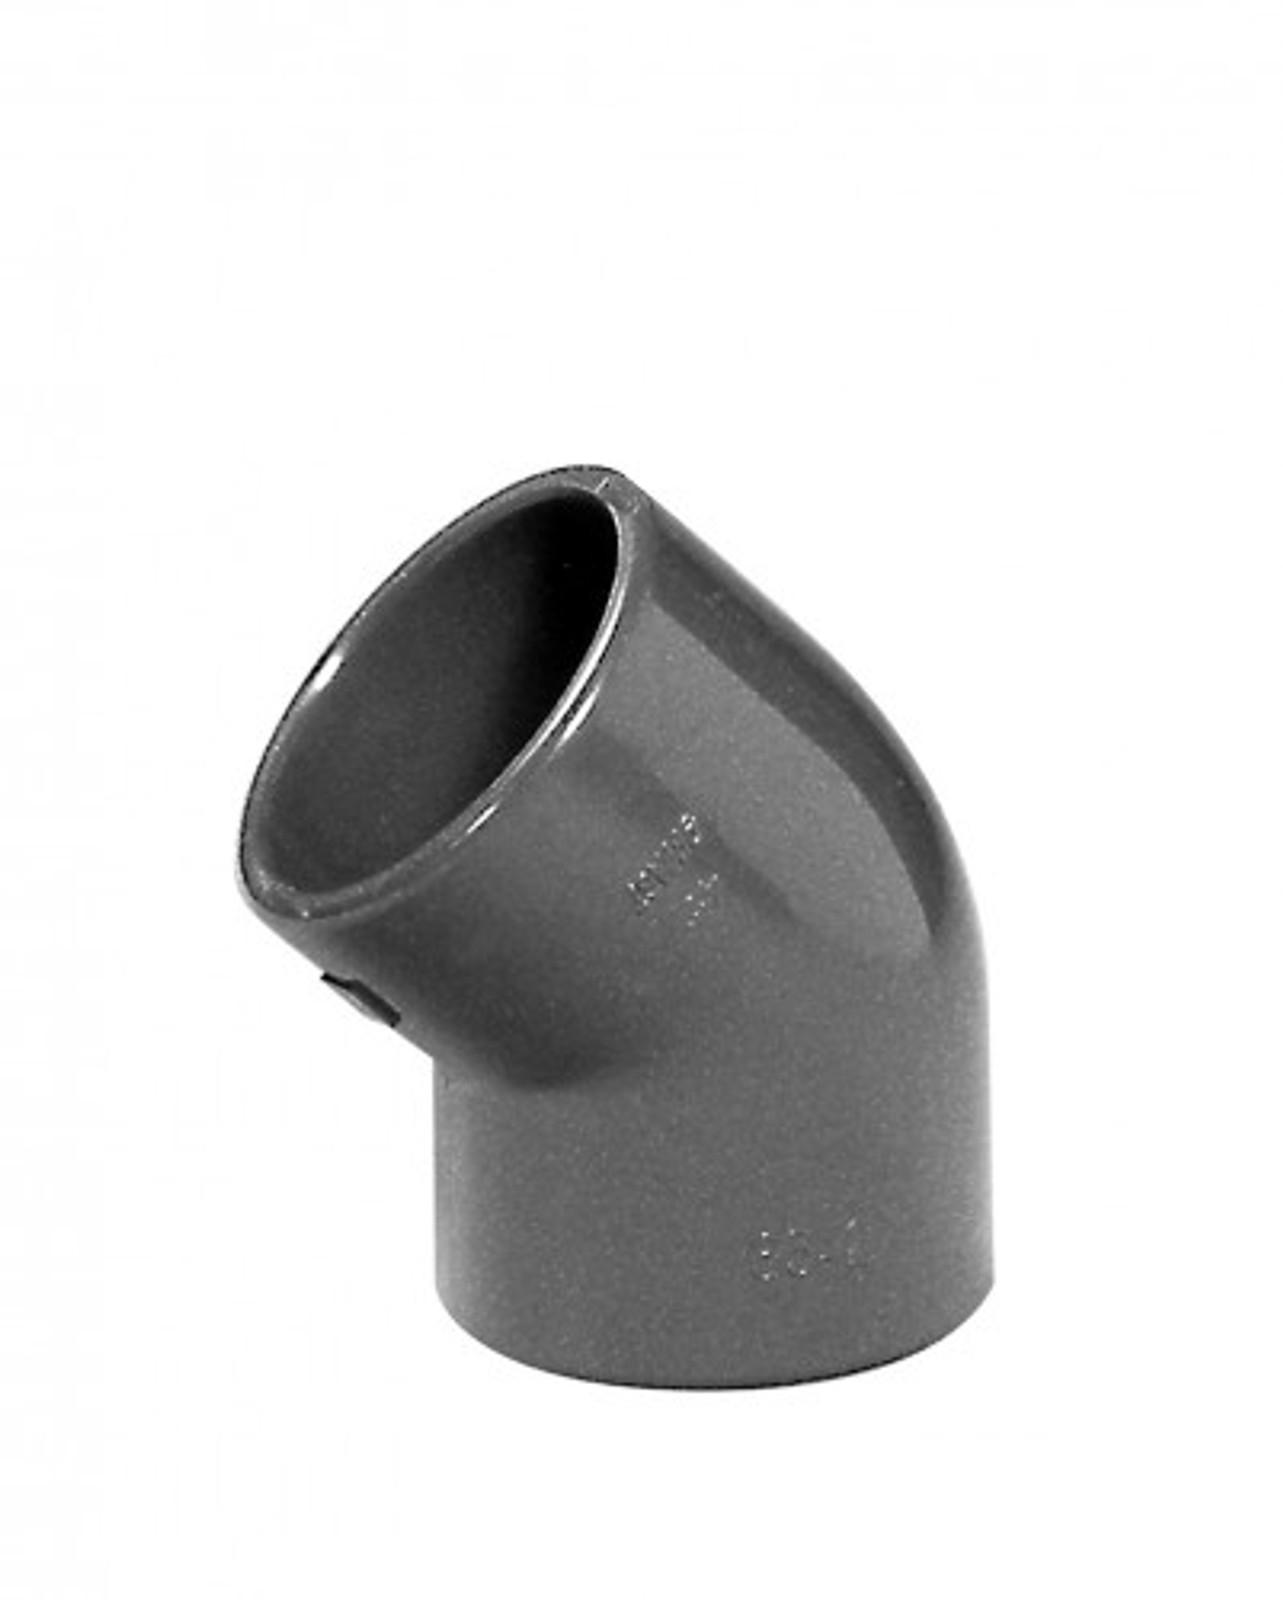 Winkel 45°, 75 mm aus PVC